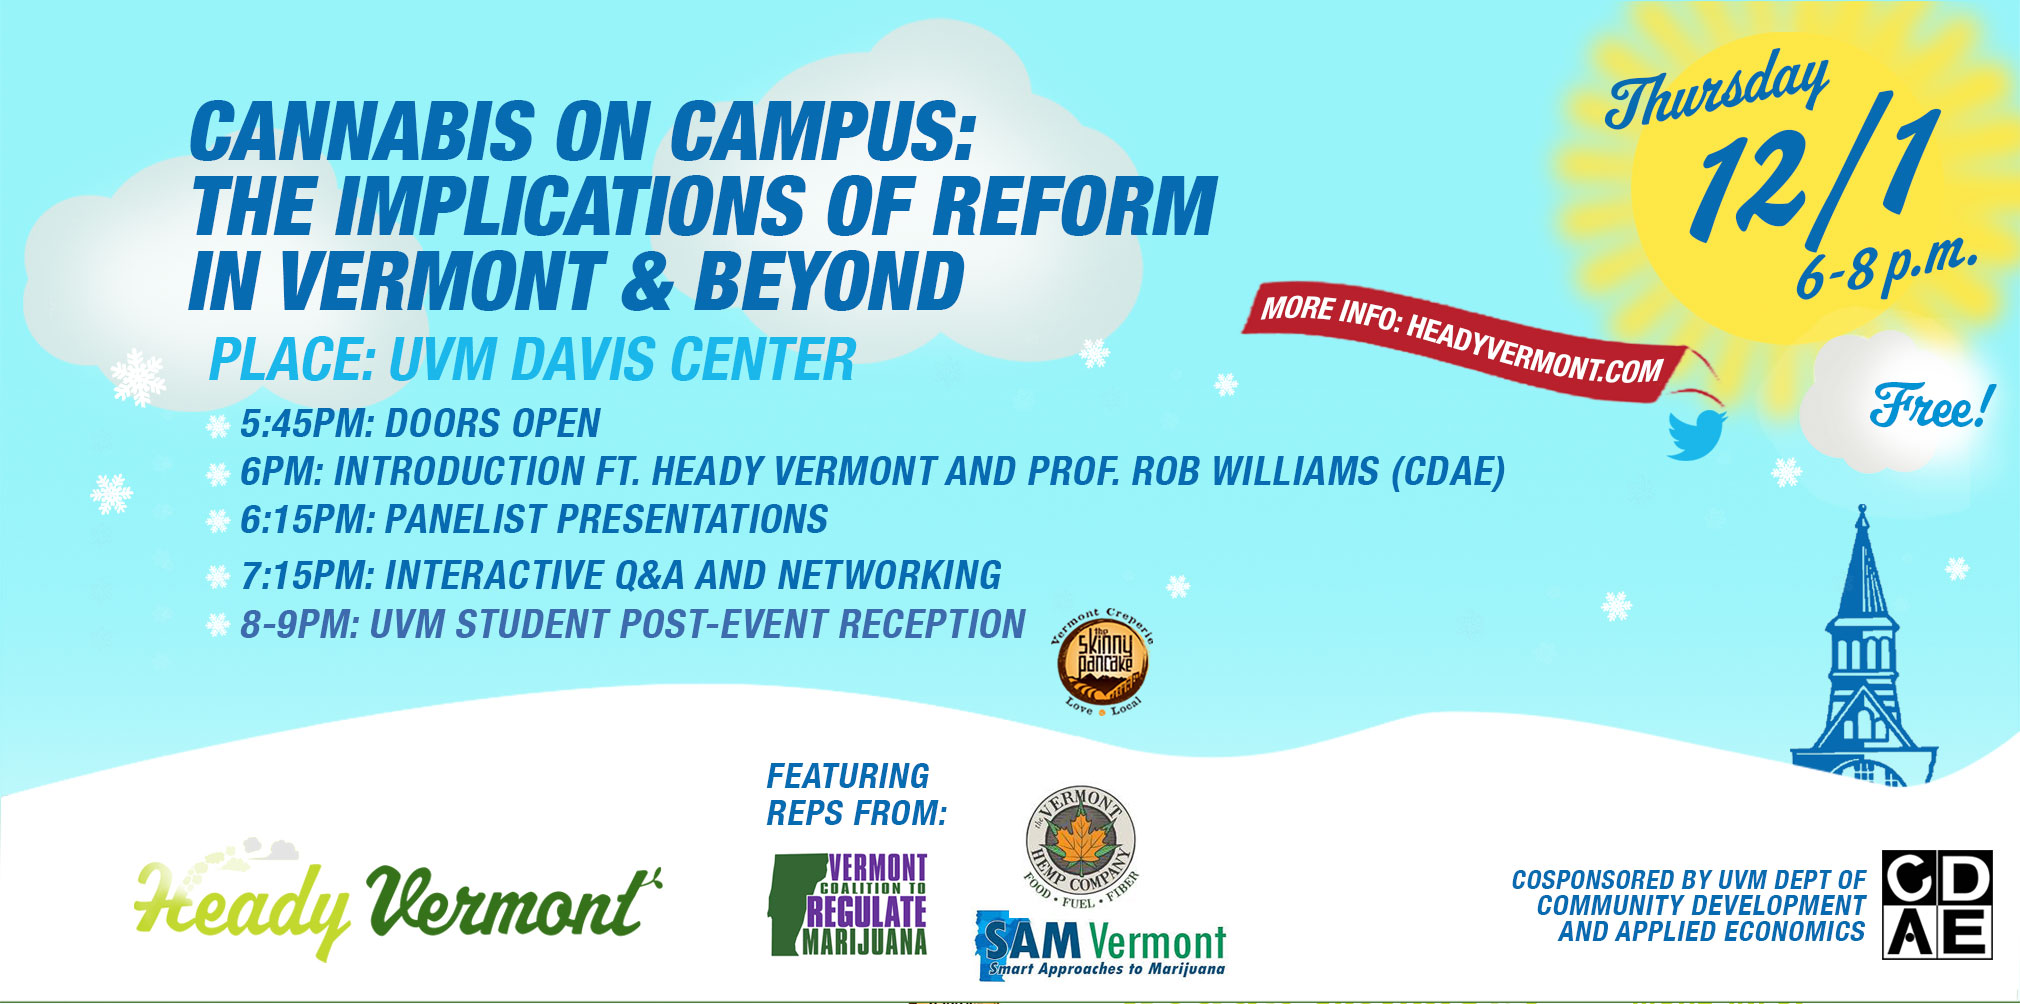 Heady Vermont Cannabis Event